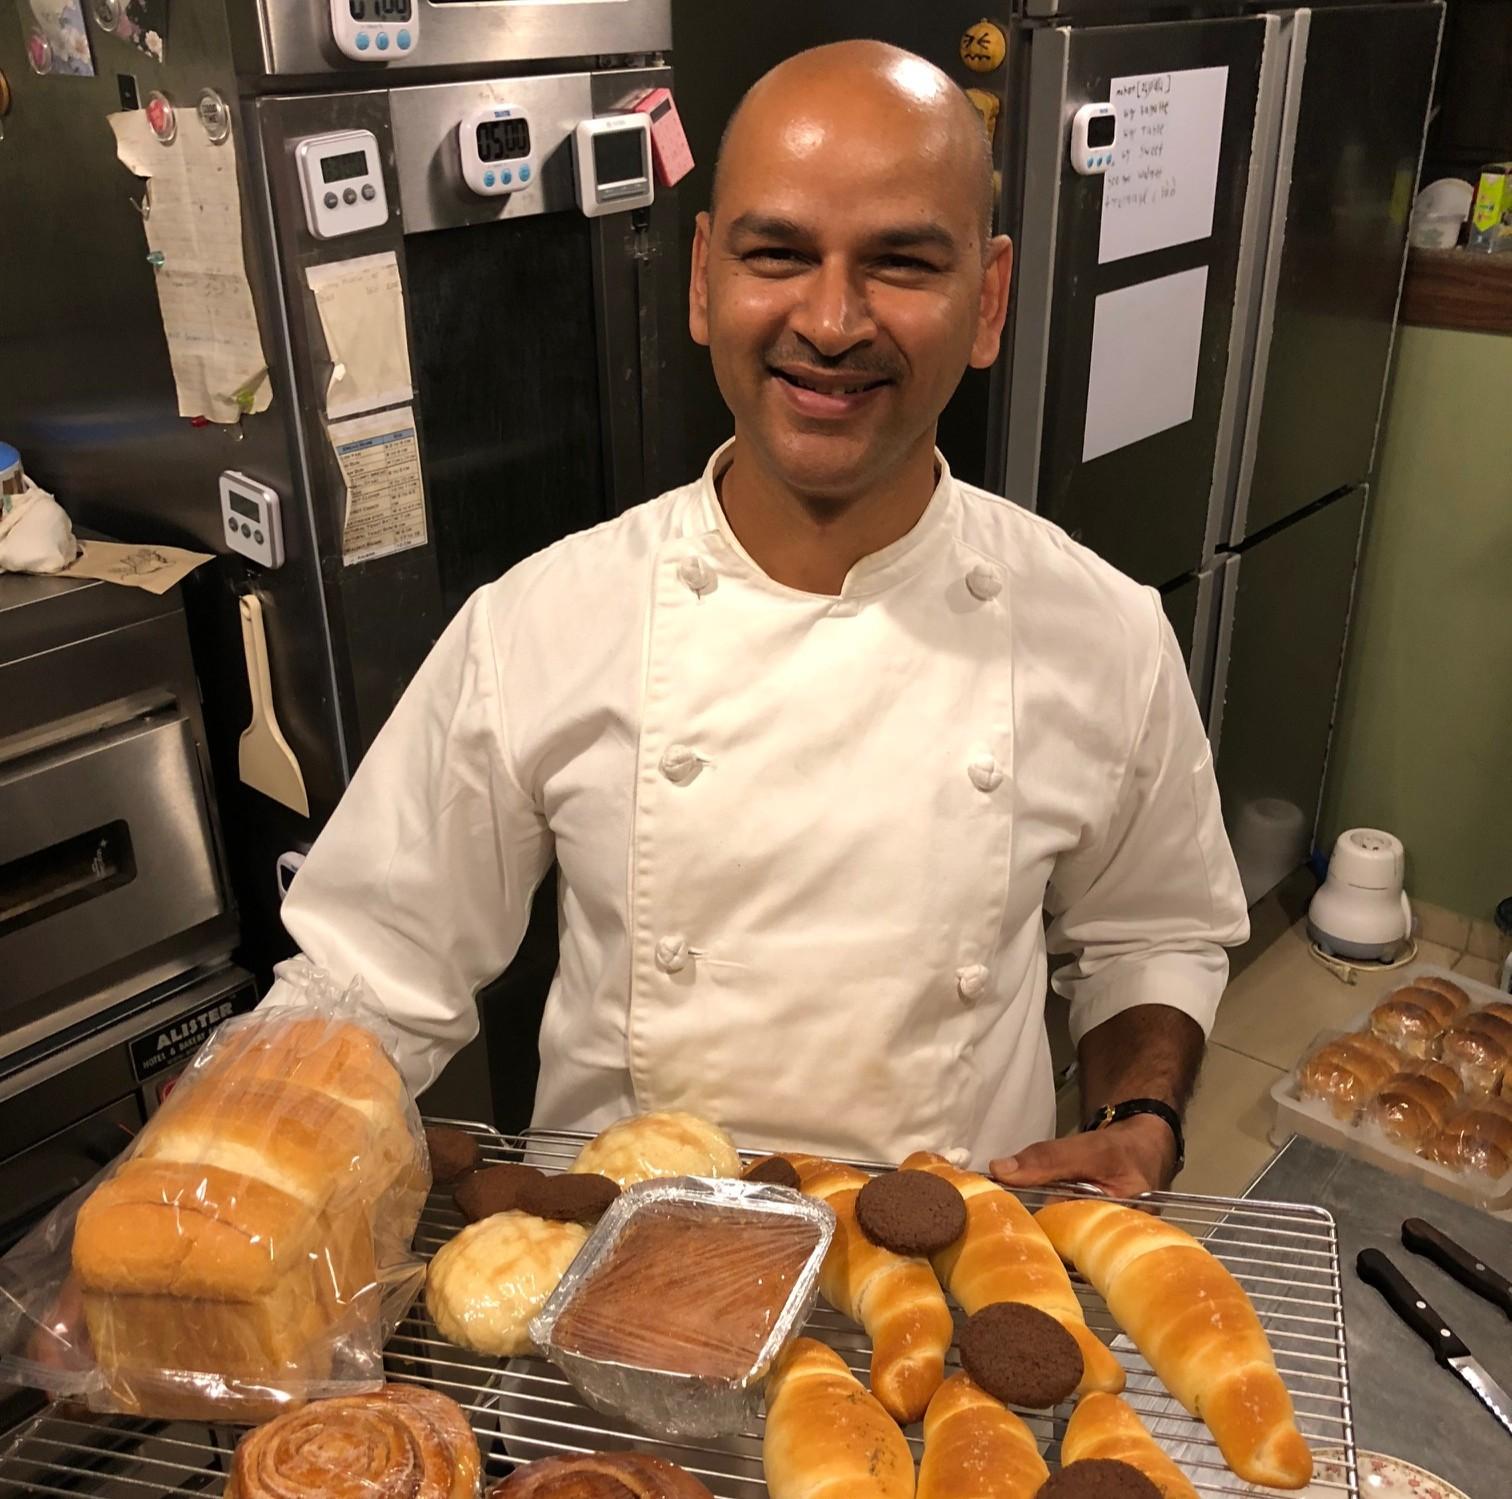 Master baker Tsunetaka Kawakami hired Rahul at Okayama Kobo, his well-known baking studio, for a year